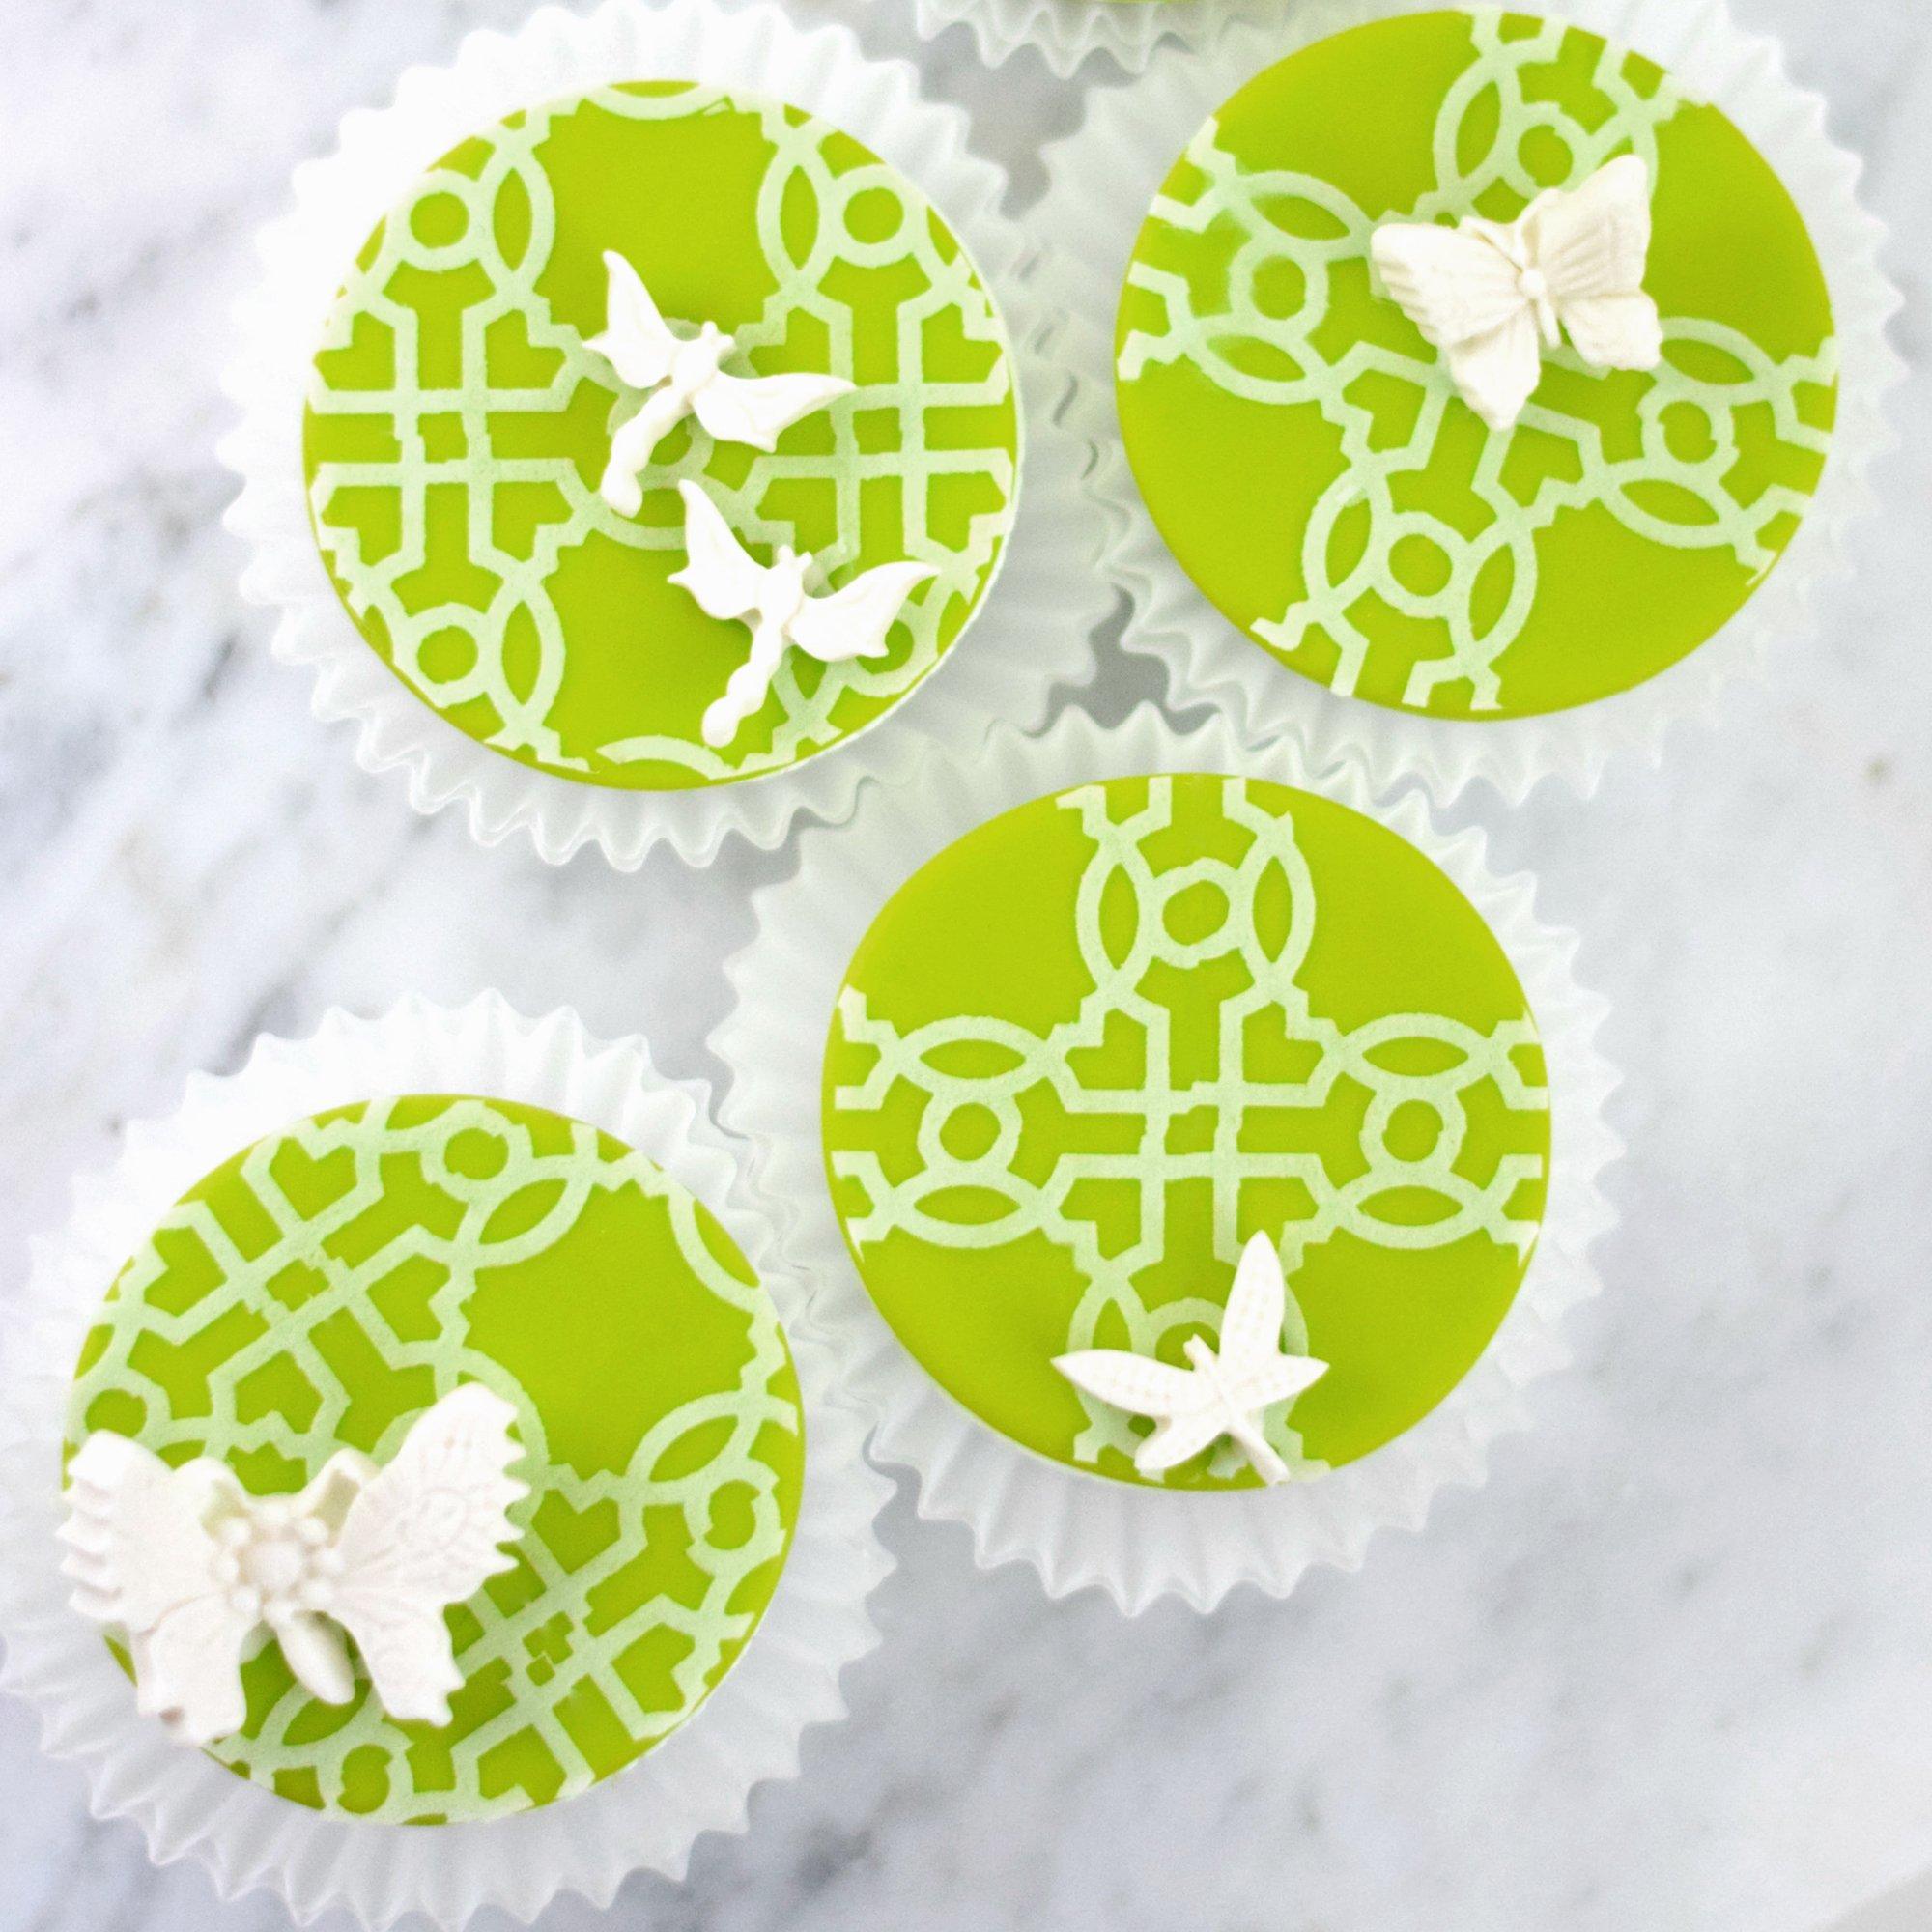 Satin Ice Bright Green Fondant, Vanilla, 5 Pounds by Satin Ice (Image #4)